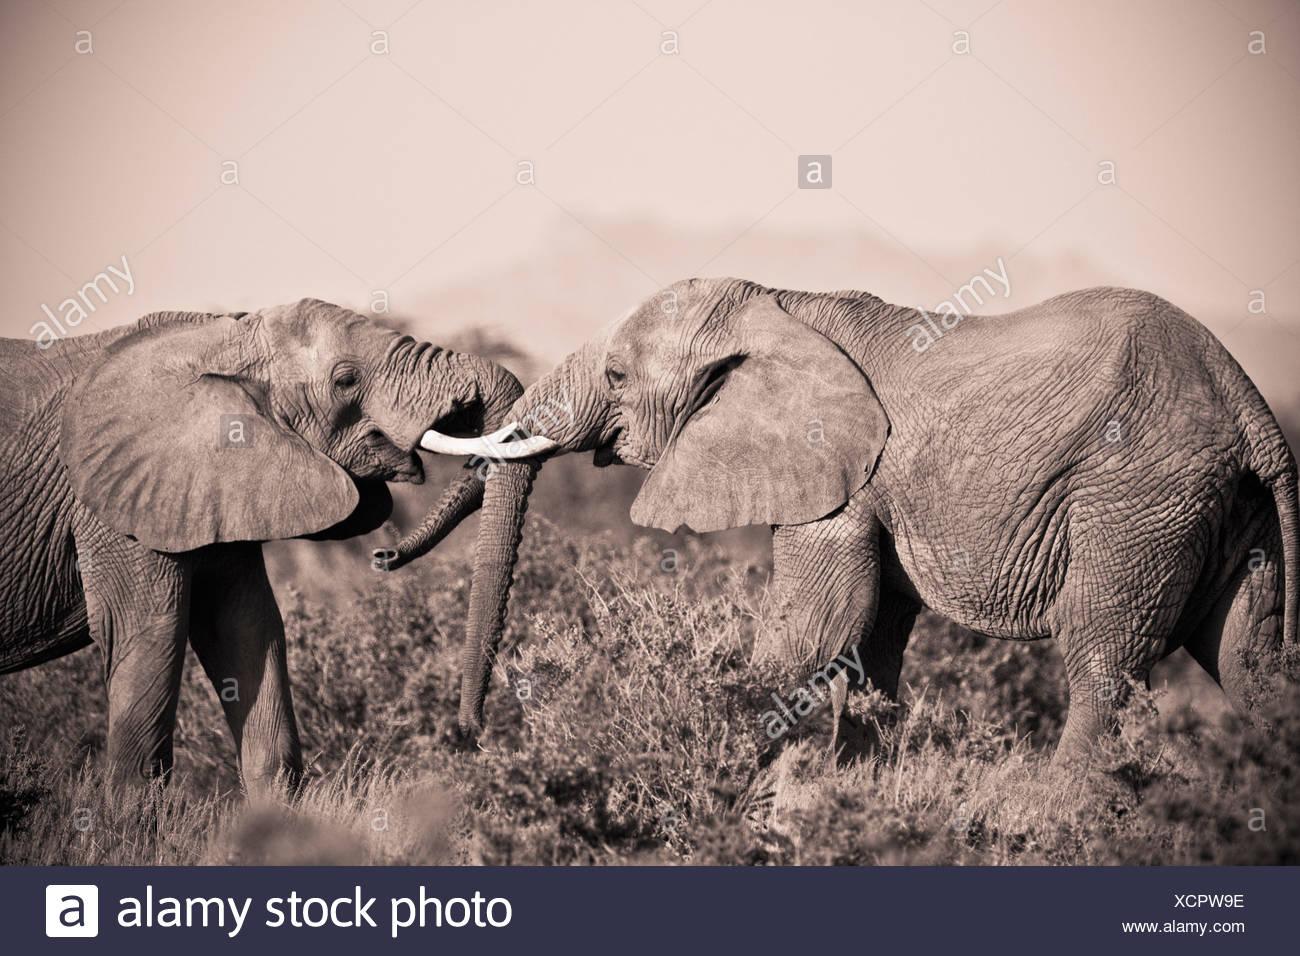 Two Elephants With Their Trunks Touching; Samburu Kenya - Stock Image